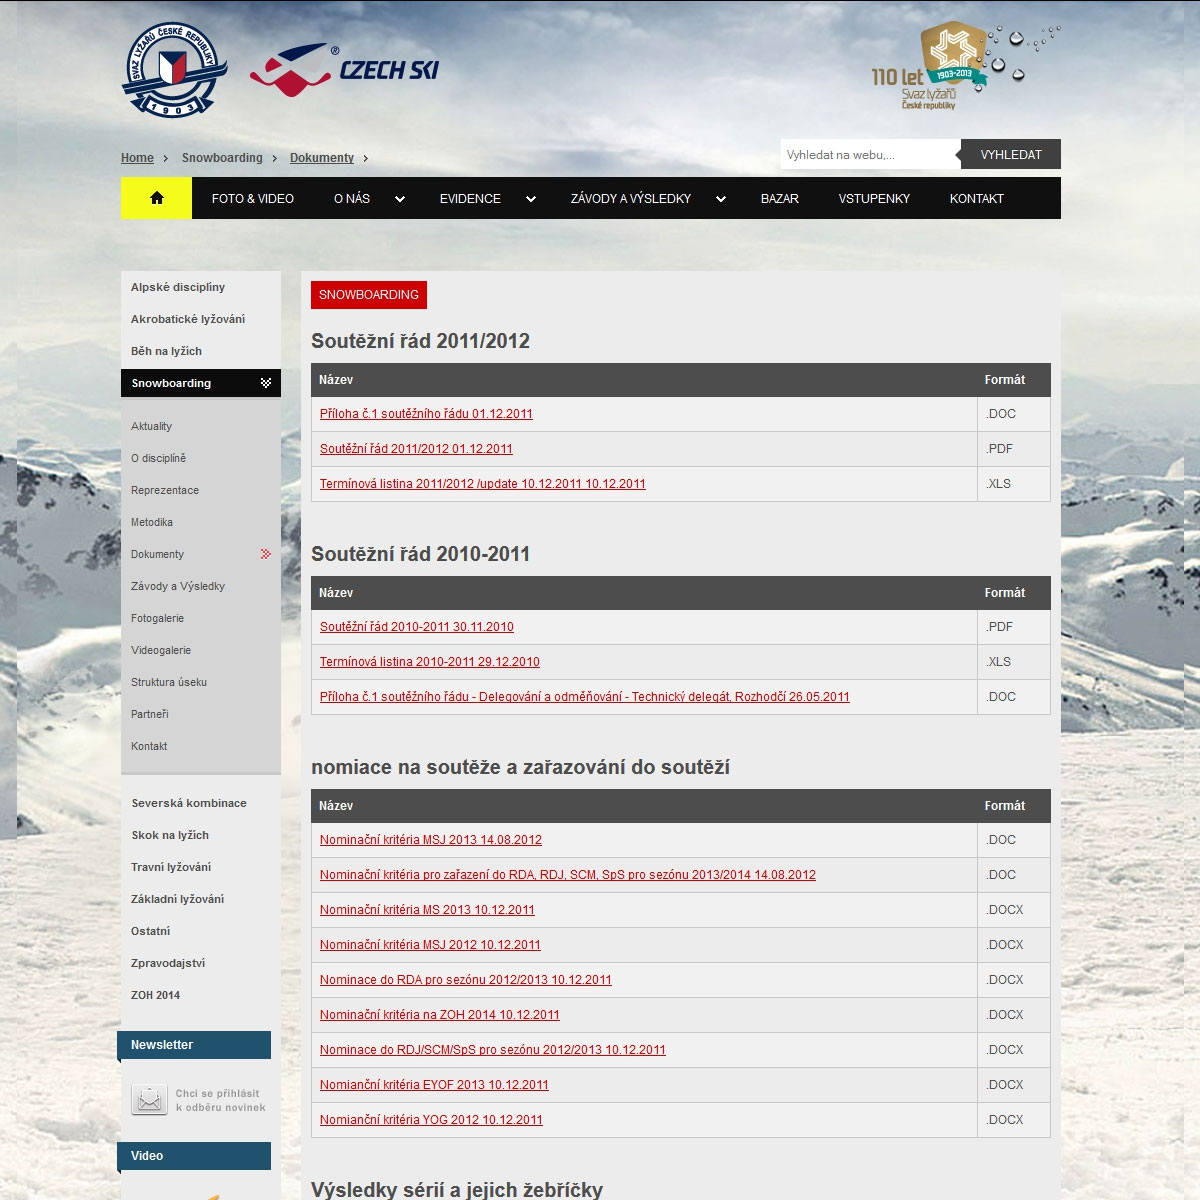 Fotografie czech-ski2014-4_big.jpg